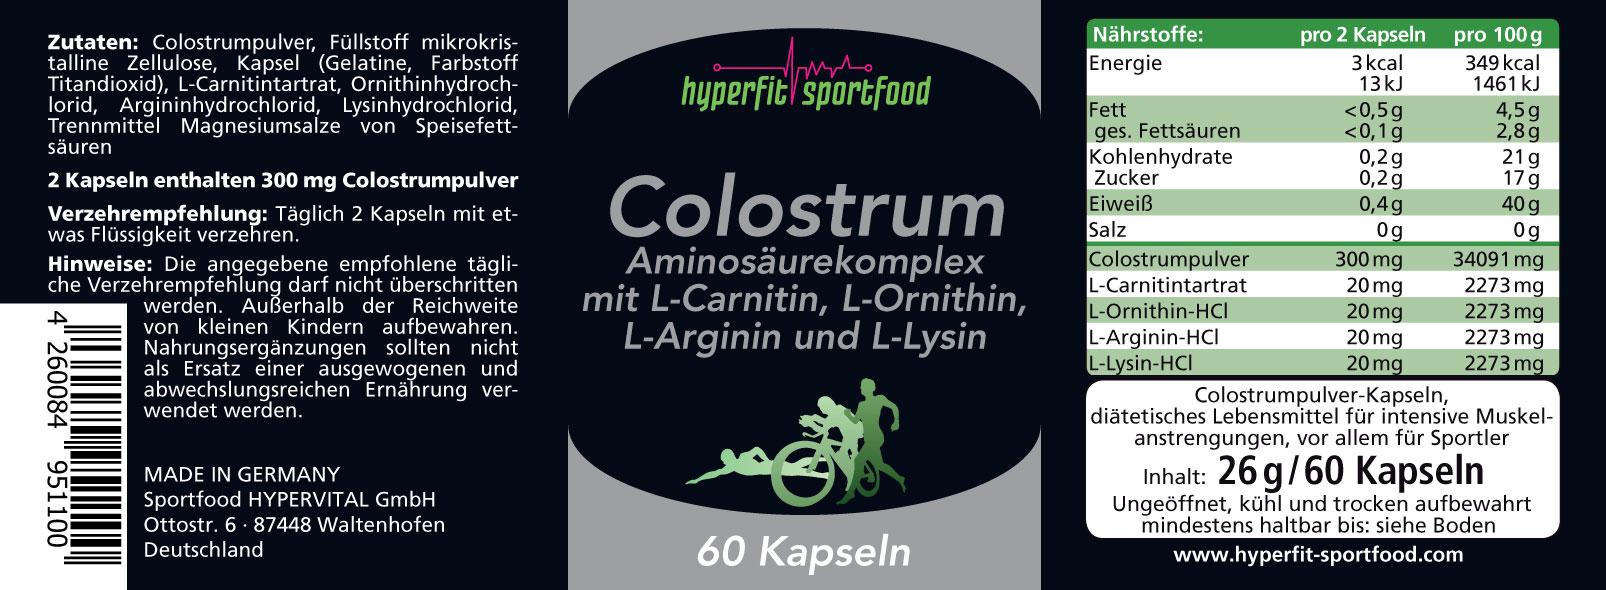 Colostrum-Info